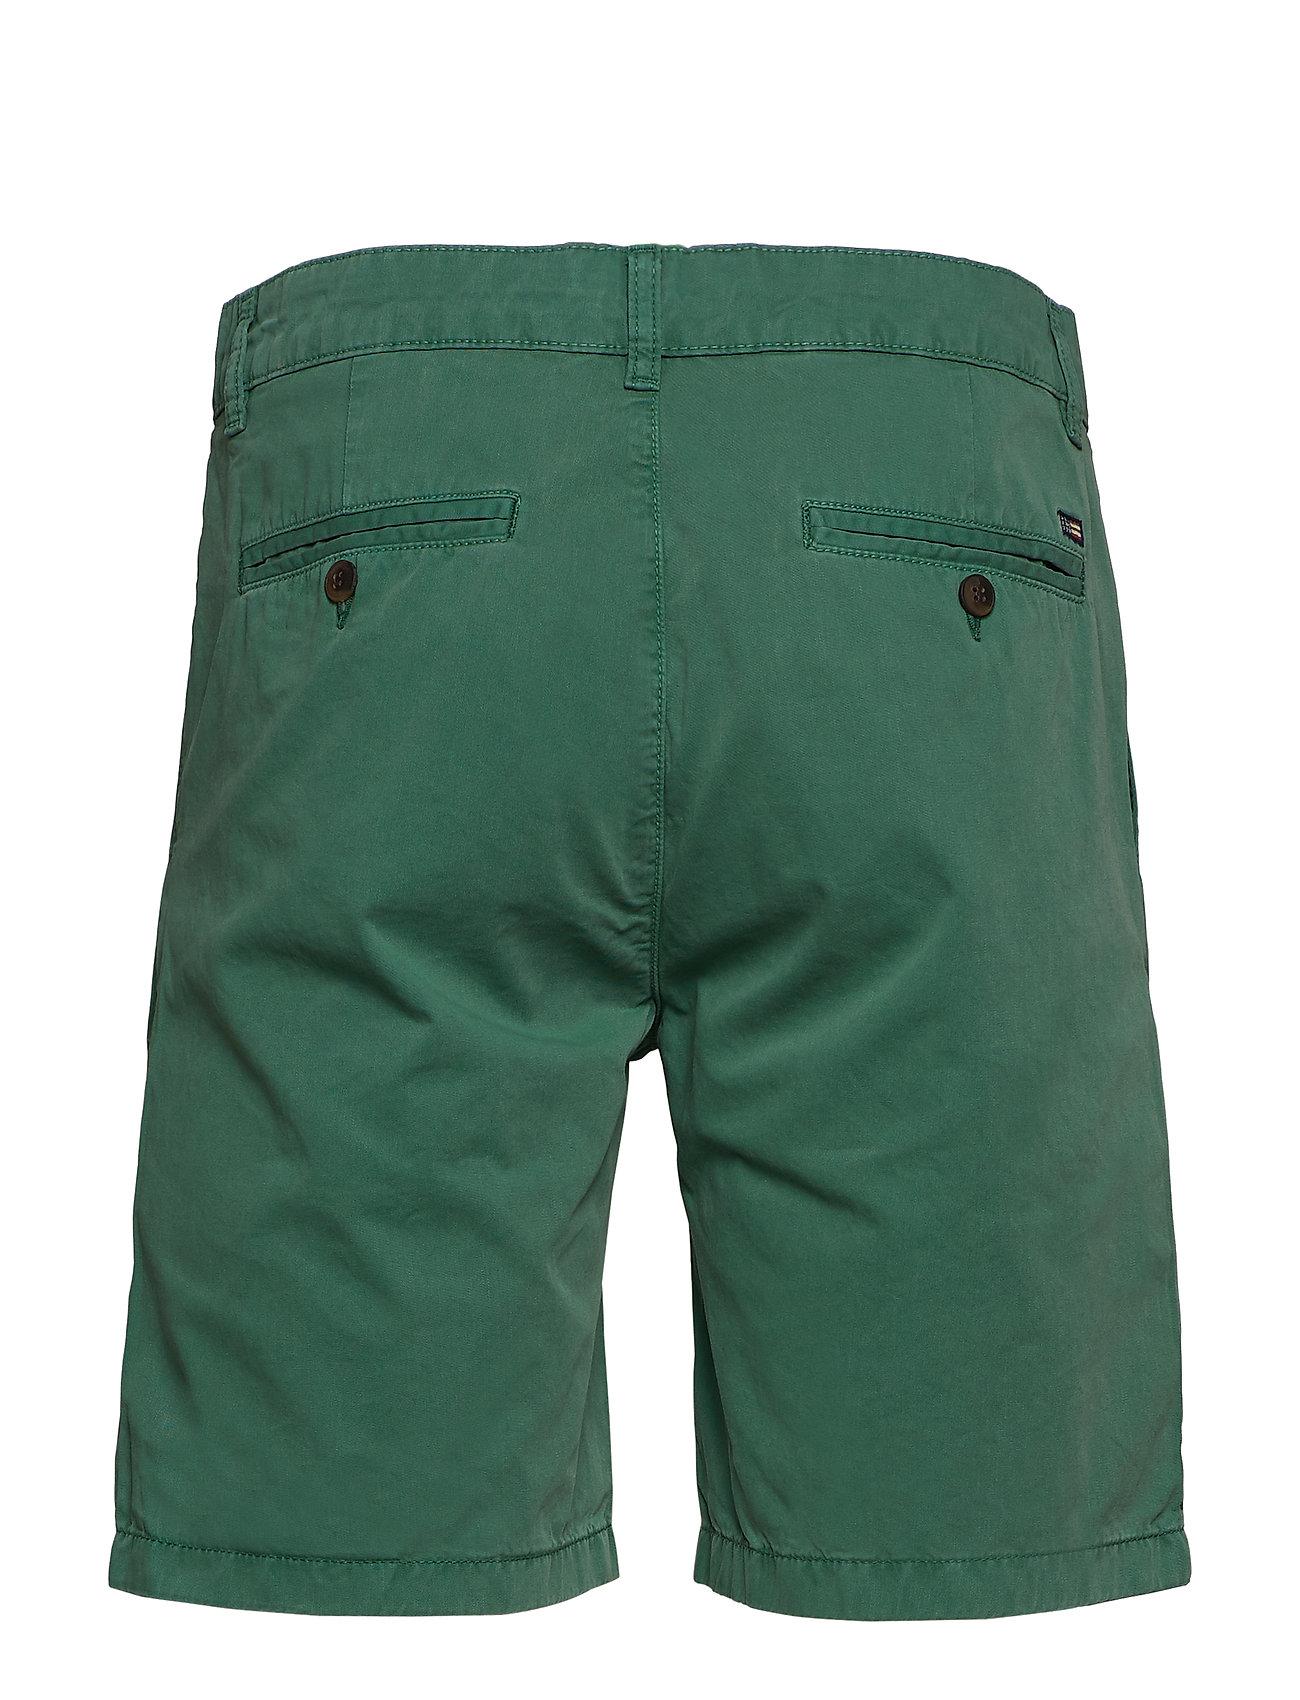 Gavin GreenLexington Clothing Gavin Chino Shortsfoliage Chino GreenLexington Chino Gavin Clothing Shortsfoliage Shortsfoliage GreenLexington SzMUVp